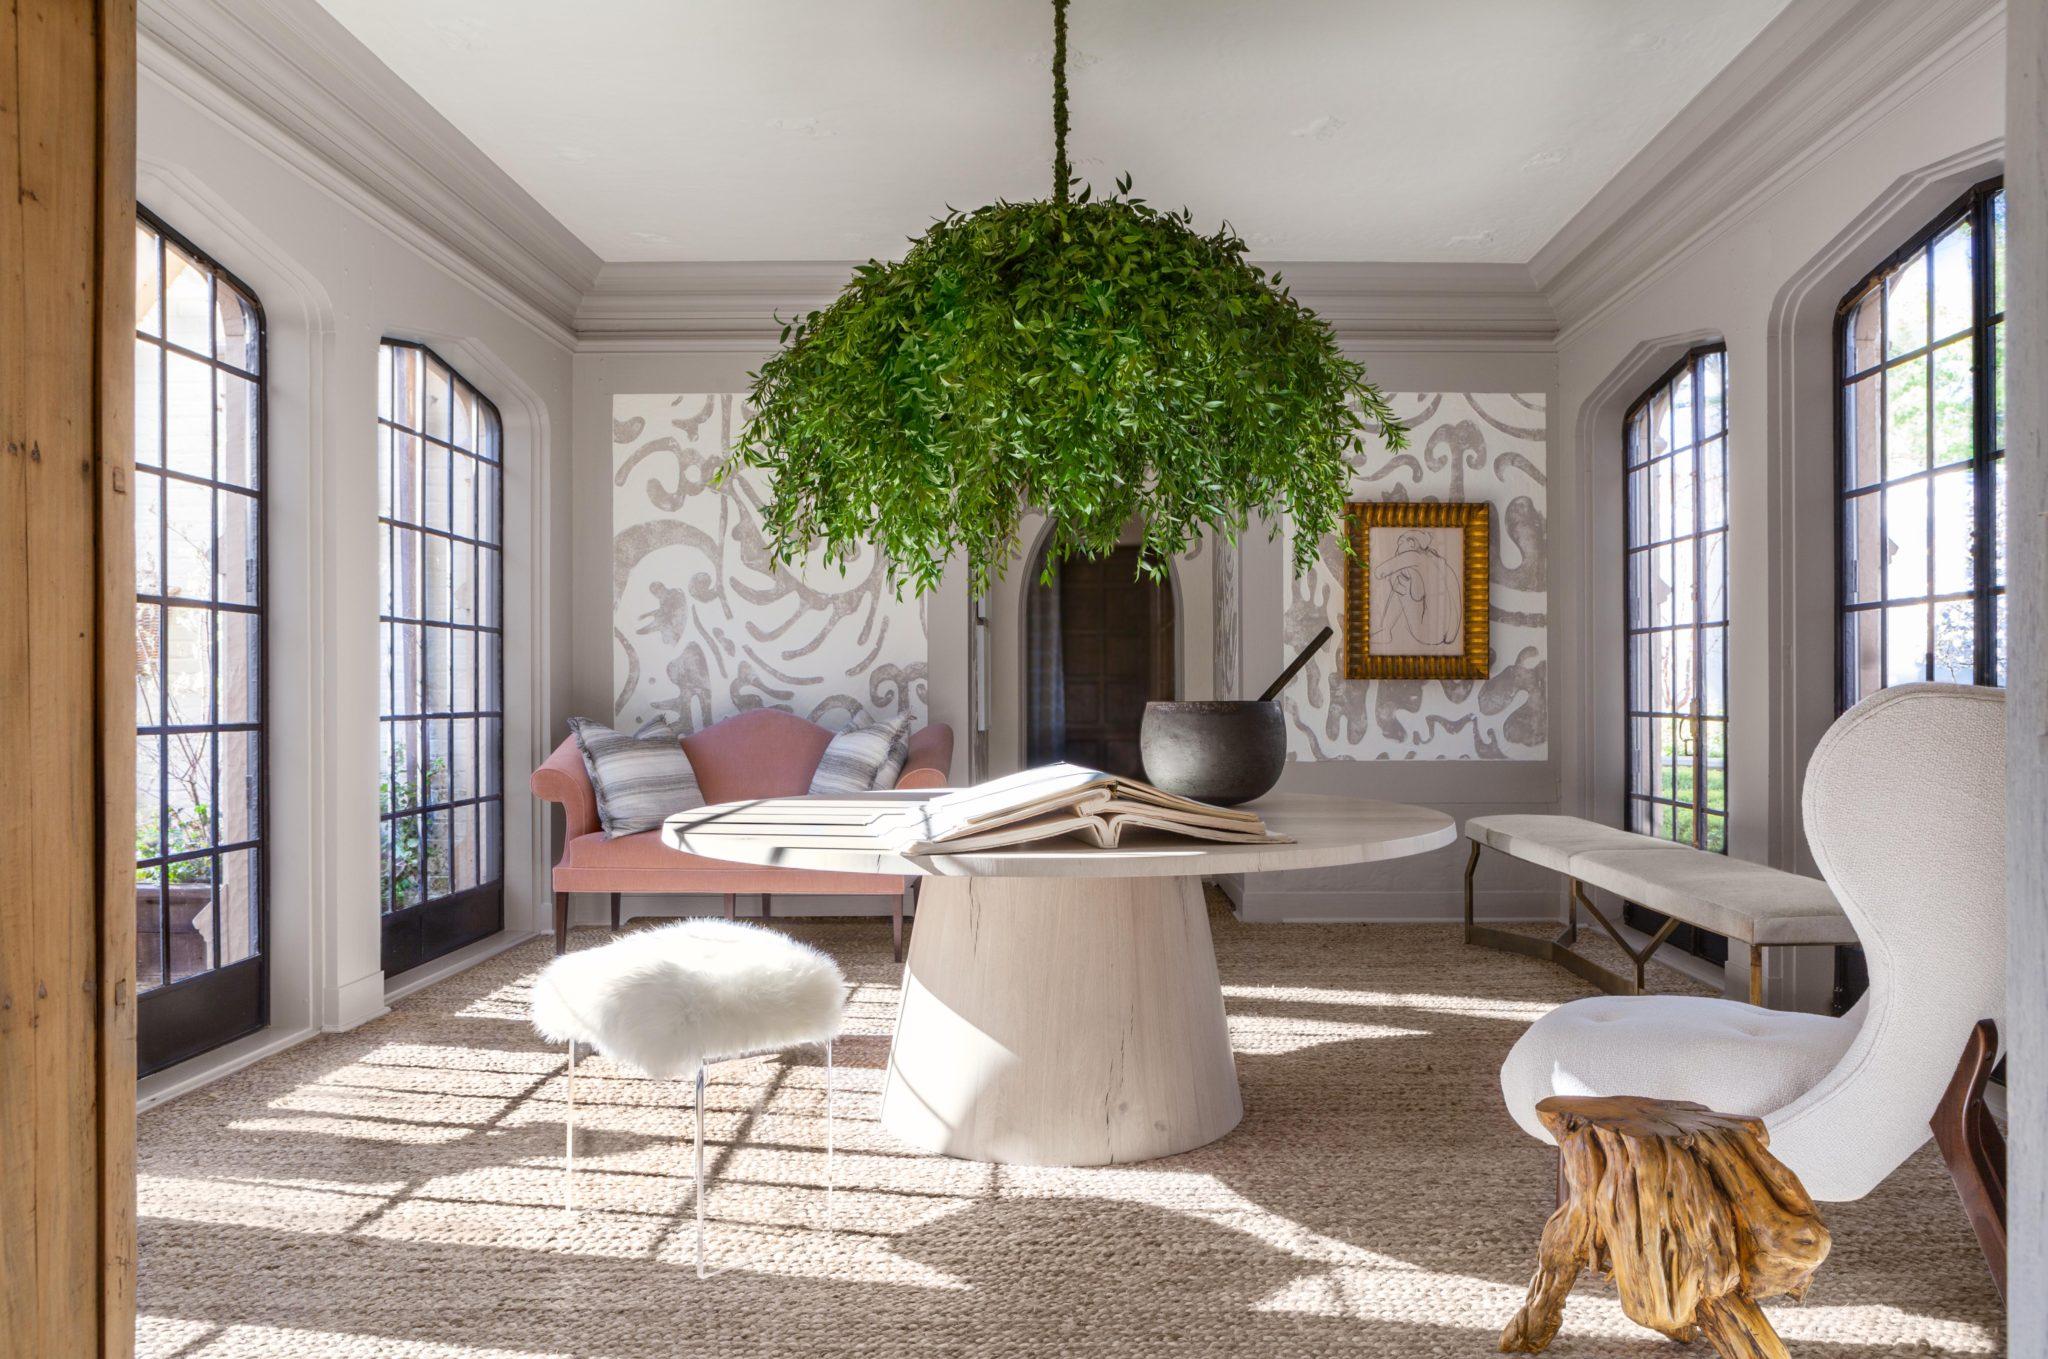 Lake Forest Garden Room by Michael Del Piero Good Design